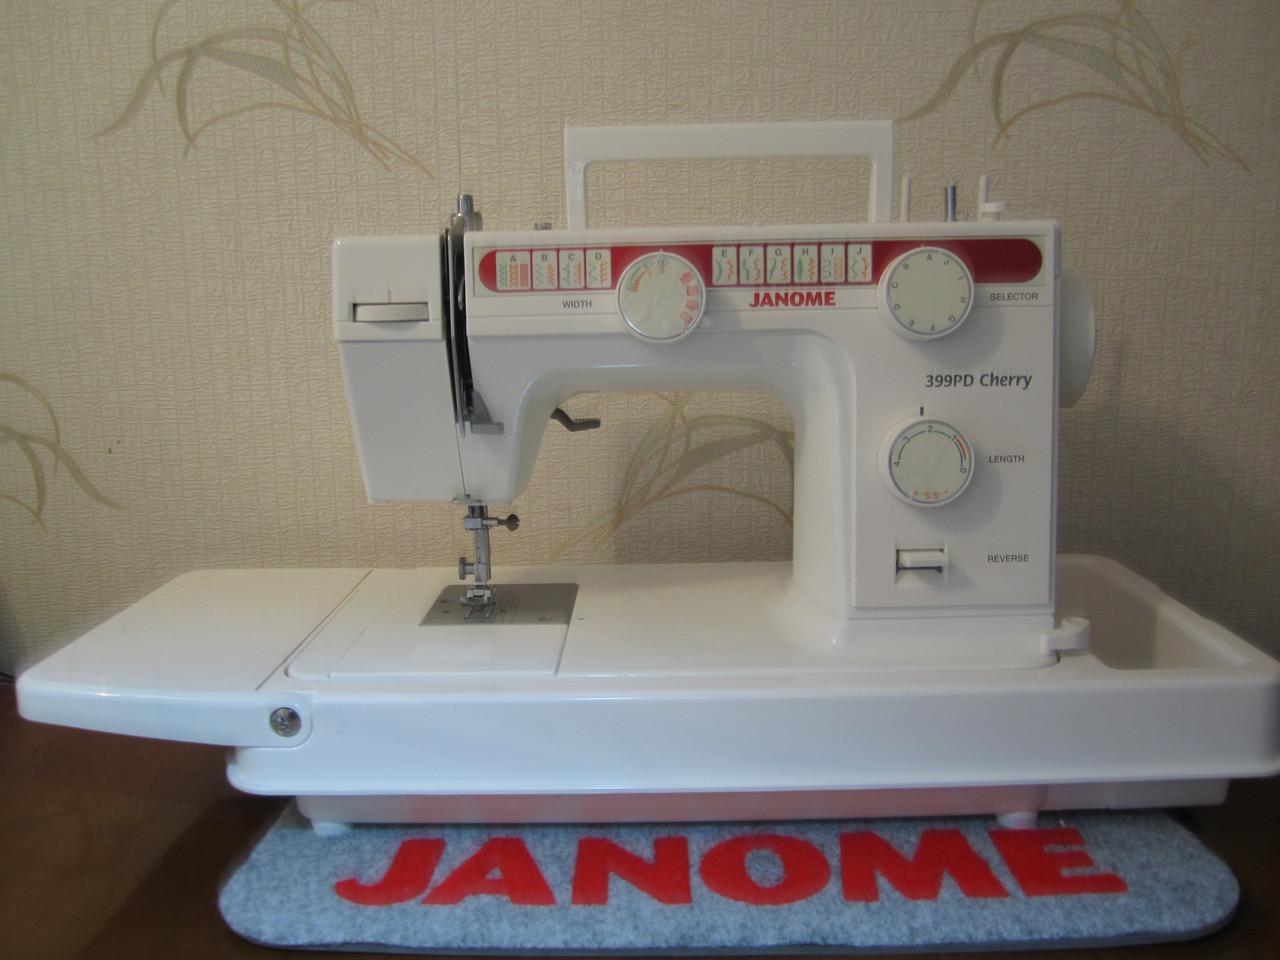 Швейная машинка Janome 399 PD Cherry со столиком